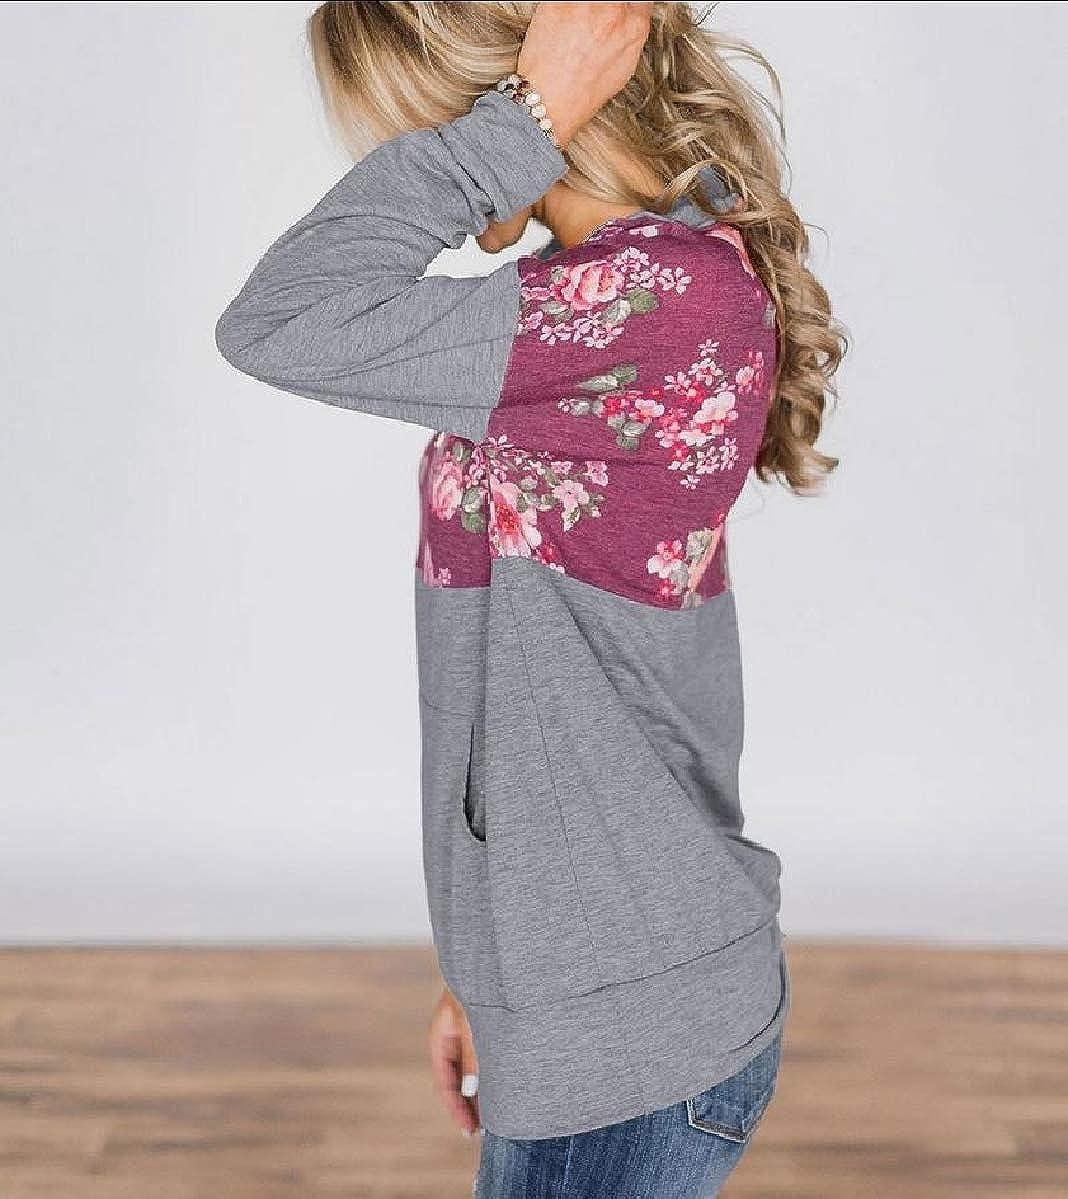 Mfasica Womens Leisure Pocket Autumn Camo Long Sleeve Sweatshirts Blouse